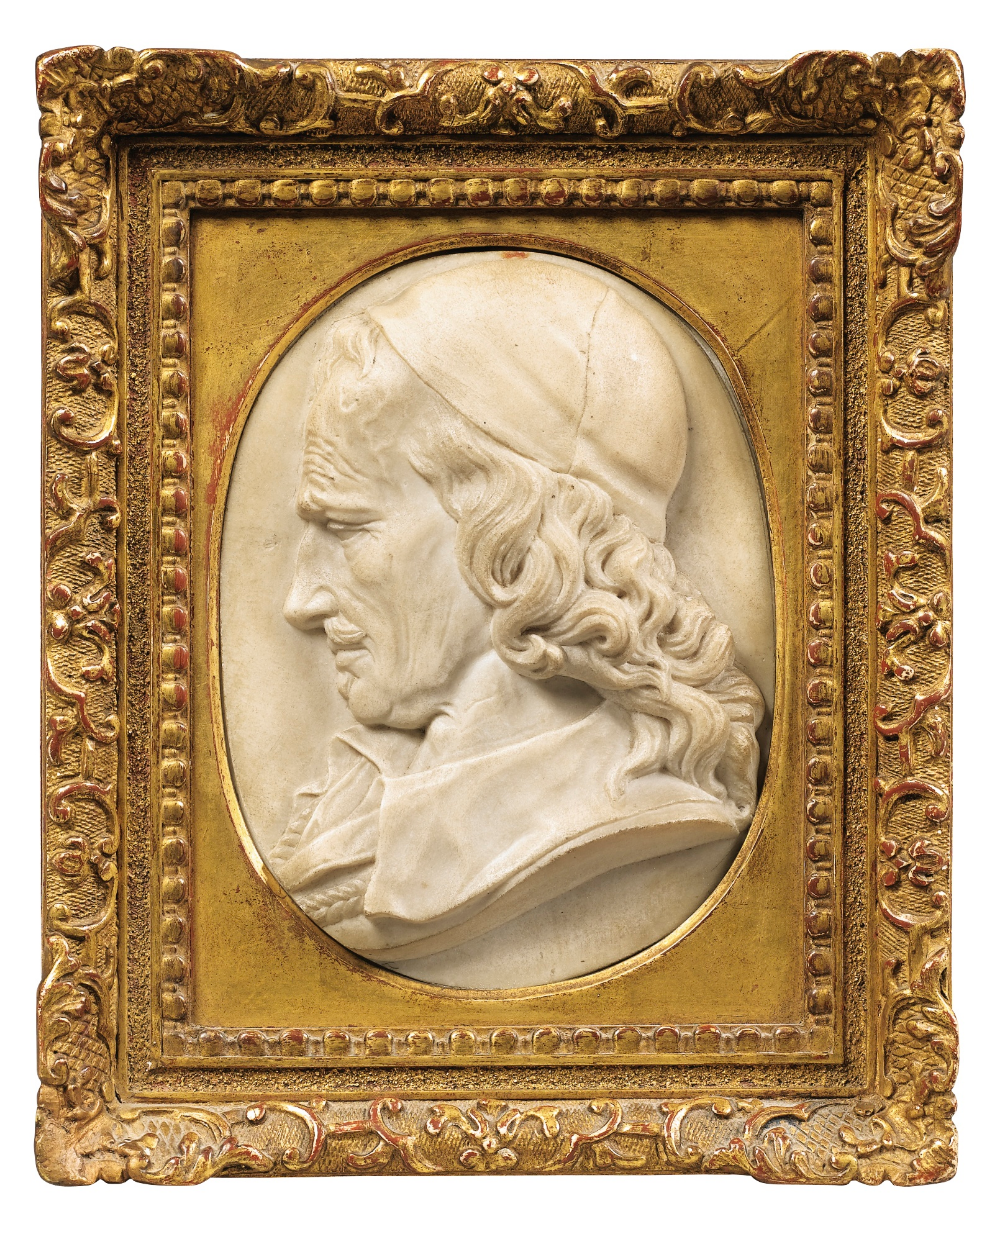 France Xviiie Siecle Medaillon Au Profil De Pierre Corneille 1606 1684 A French 18th Century Marble Medallion With The Profile Art Modern Art Lion Sculpture